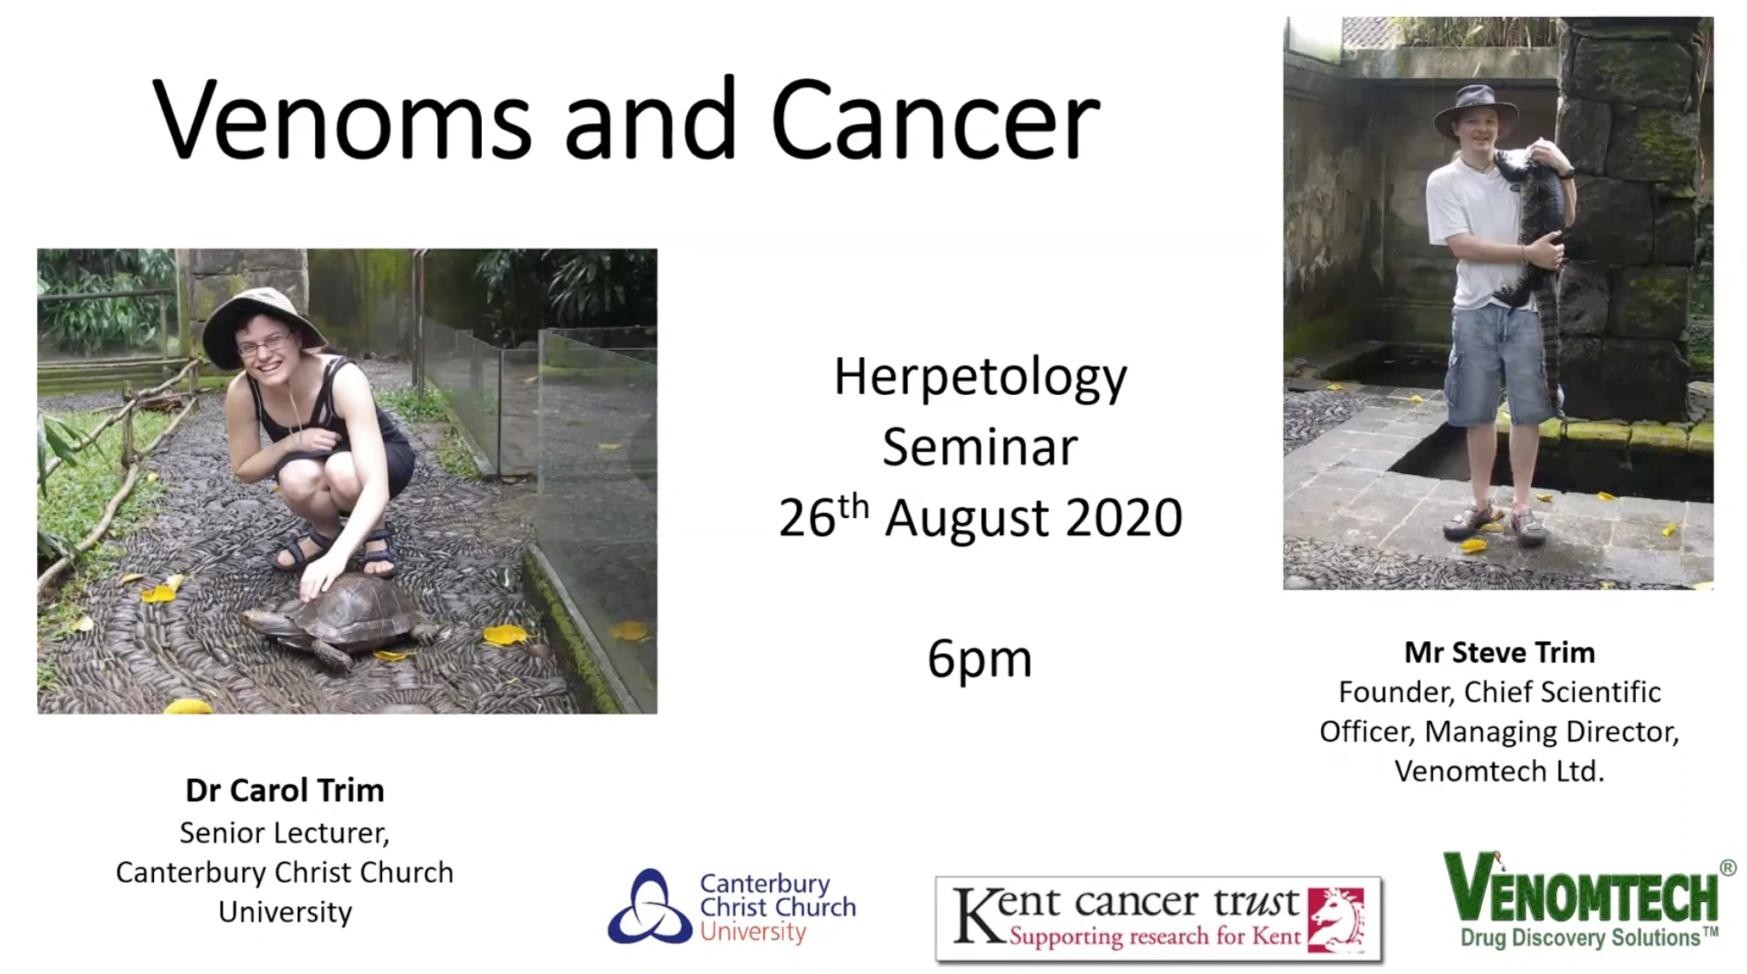 Herpetology seminar